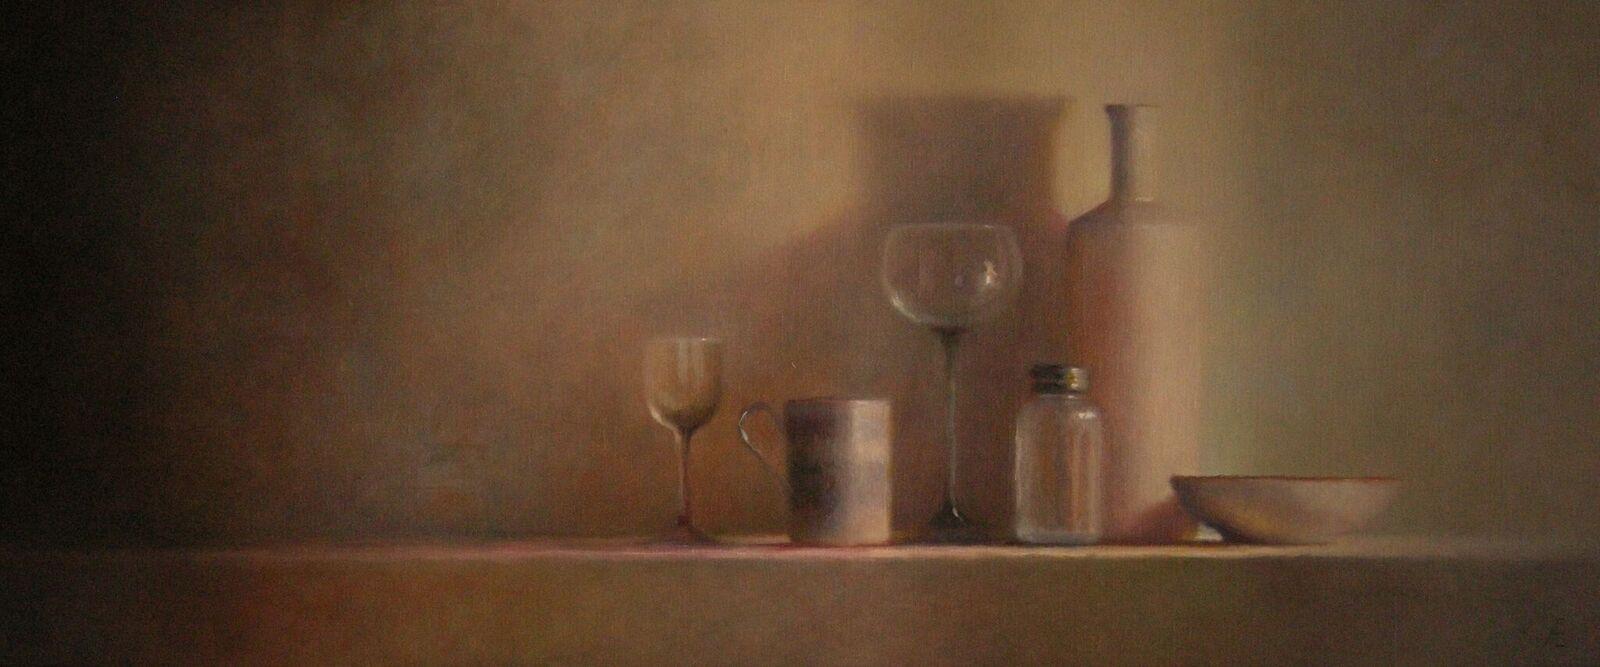 (223) Glas en porselein stilleven, olieverf op linnen, 50 x 120cm_preview